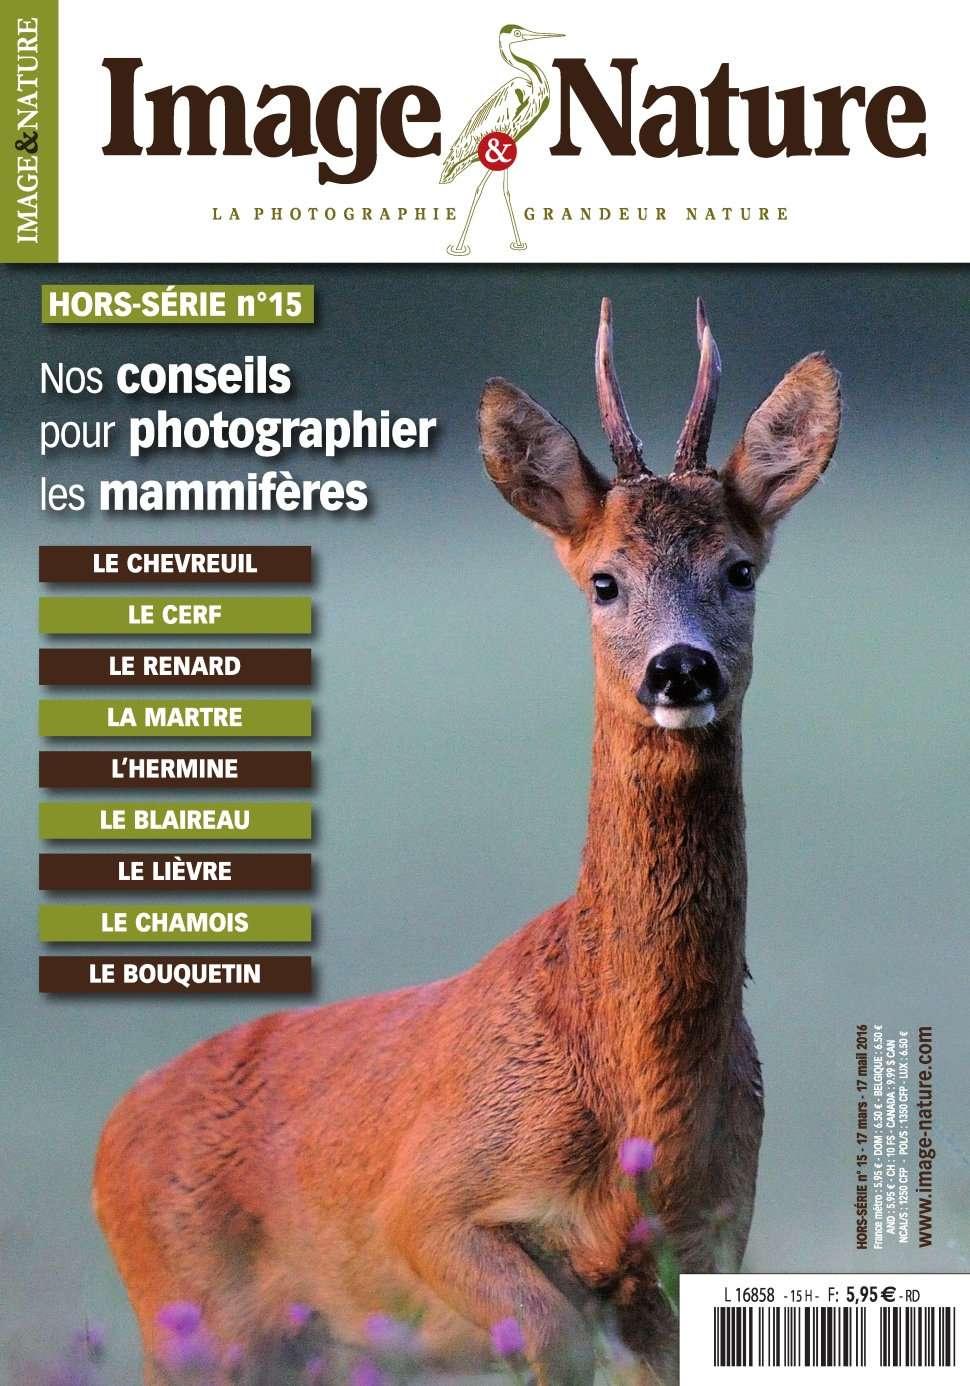 Image & Nature Hors Série 15 - Avril/Mai 2016